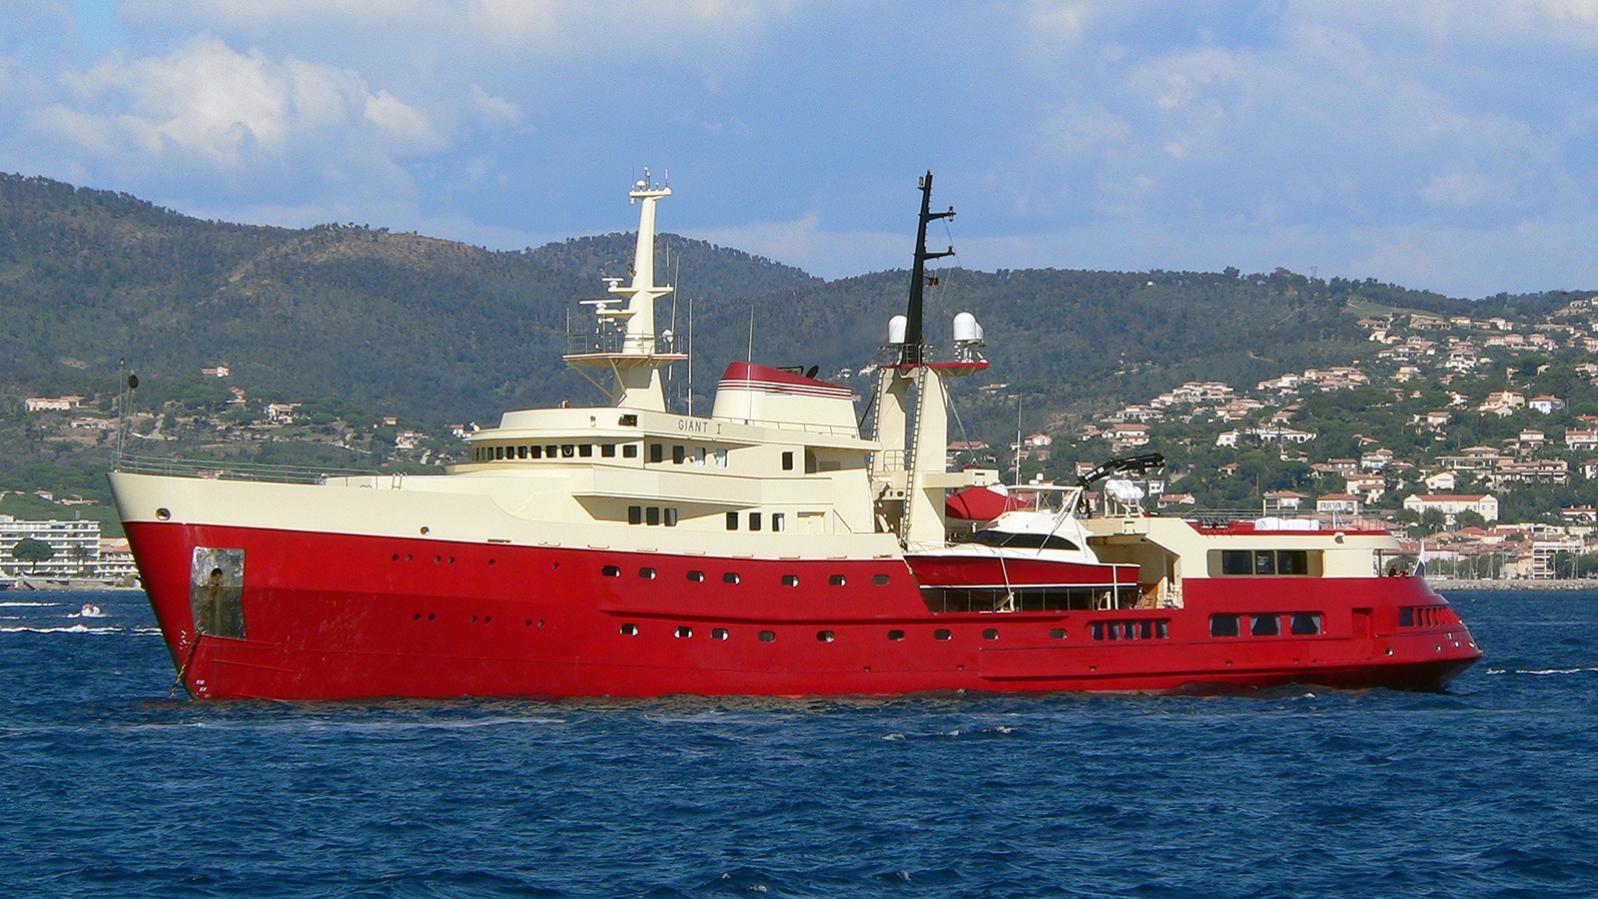 legend-motor-yacht-ihc-verschure-1974-77m-before-refit